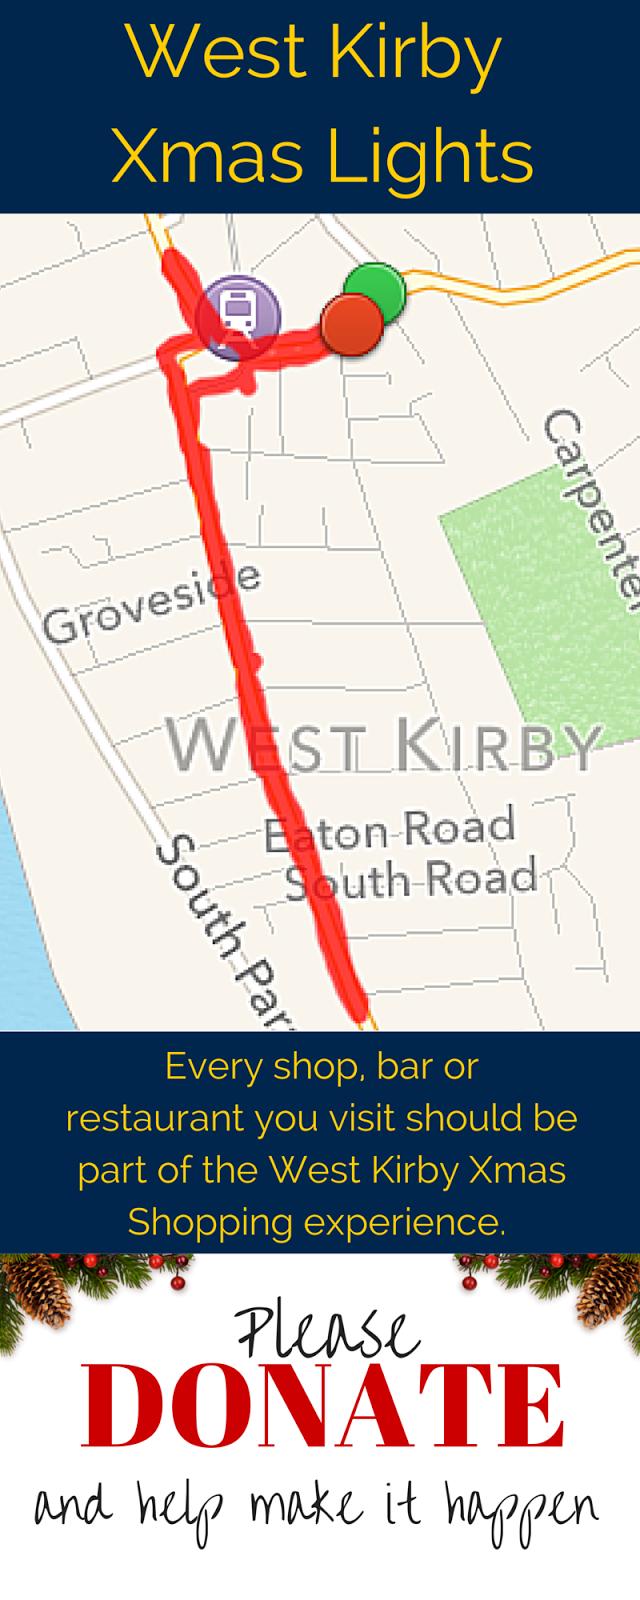 West Kirby Christmas Lights: Xmas Lights Map